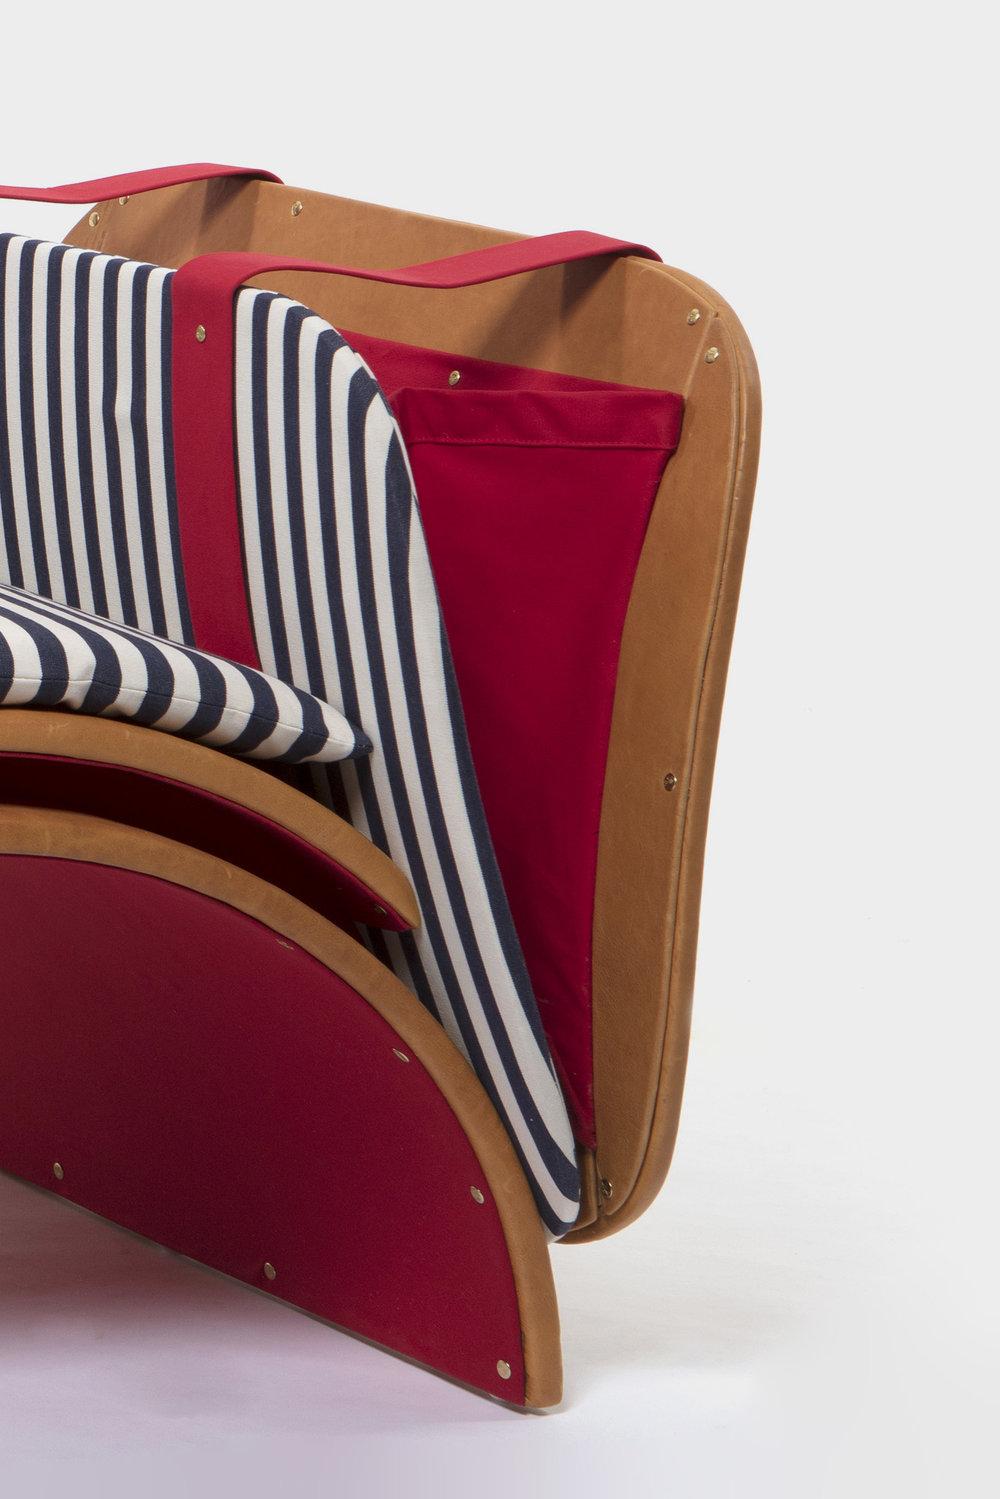 Federico Peri_Il Bisonte MDW18_Saddle armchair CUT1©Giuseppe d'Alonzo_LOW.jpg